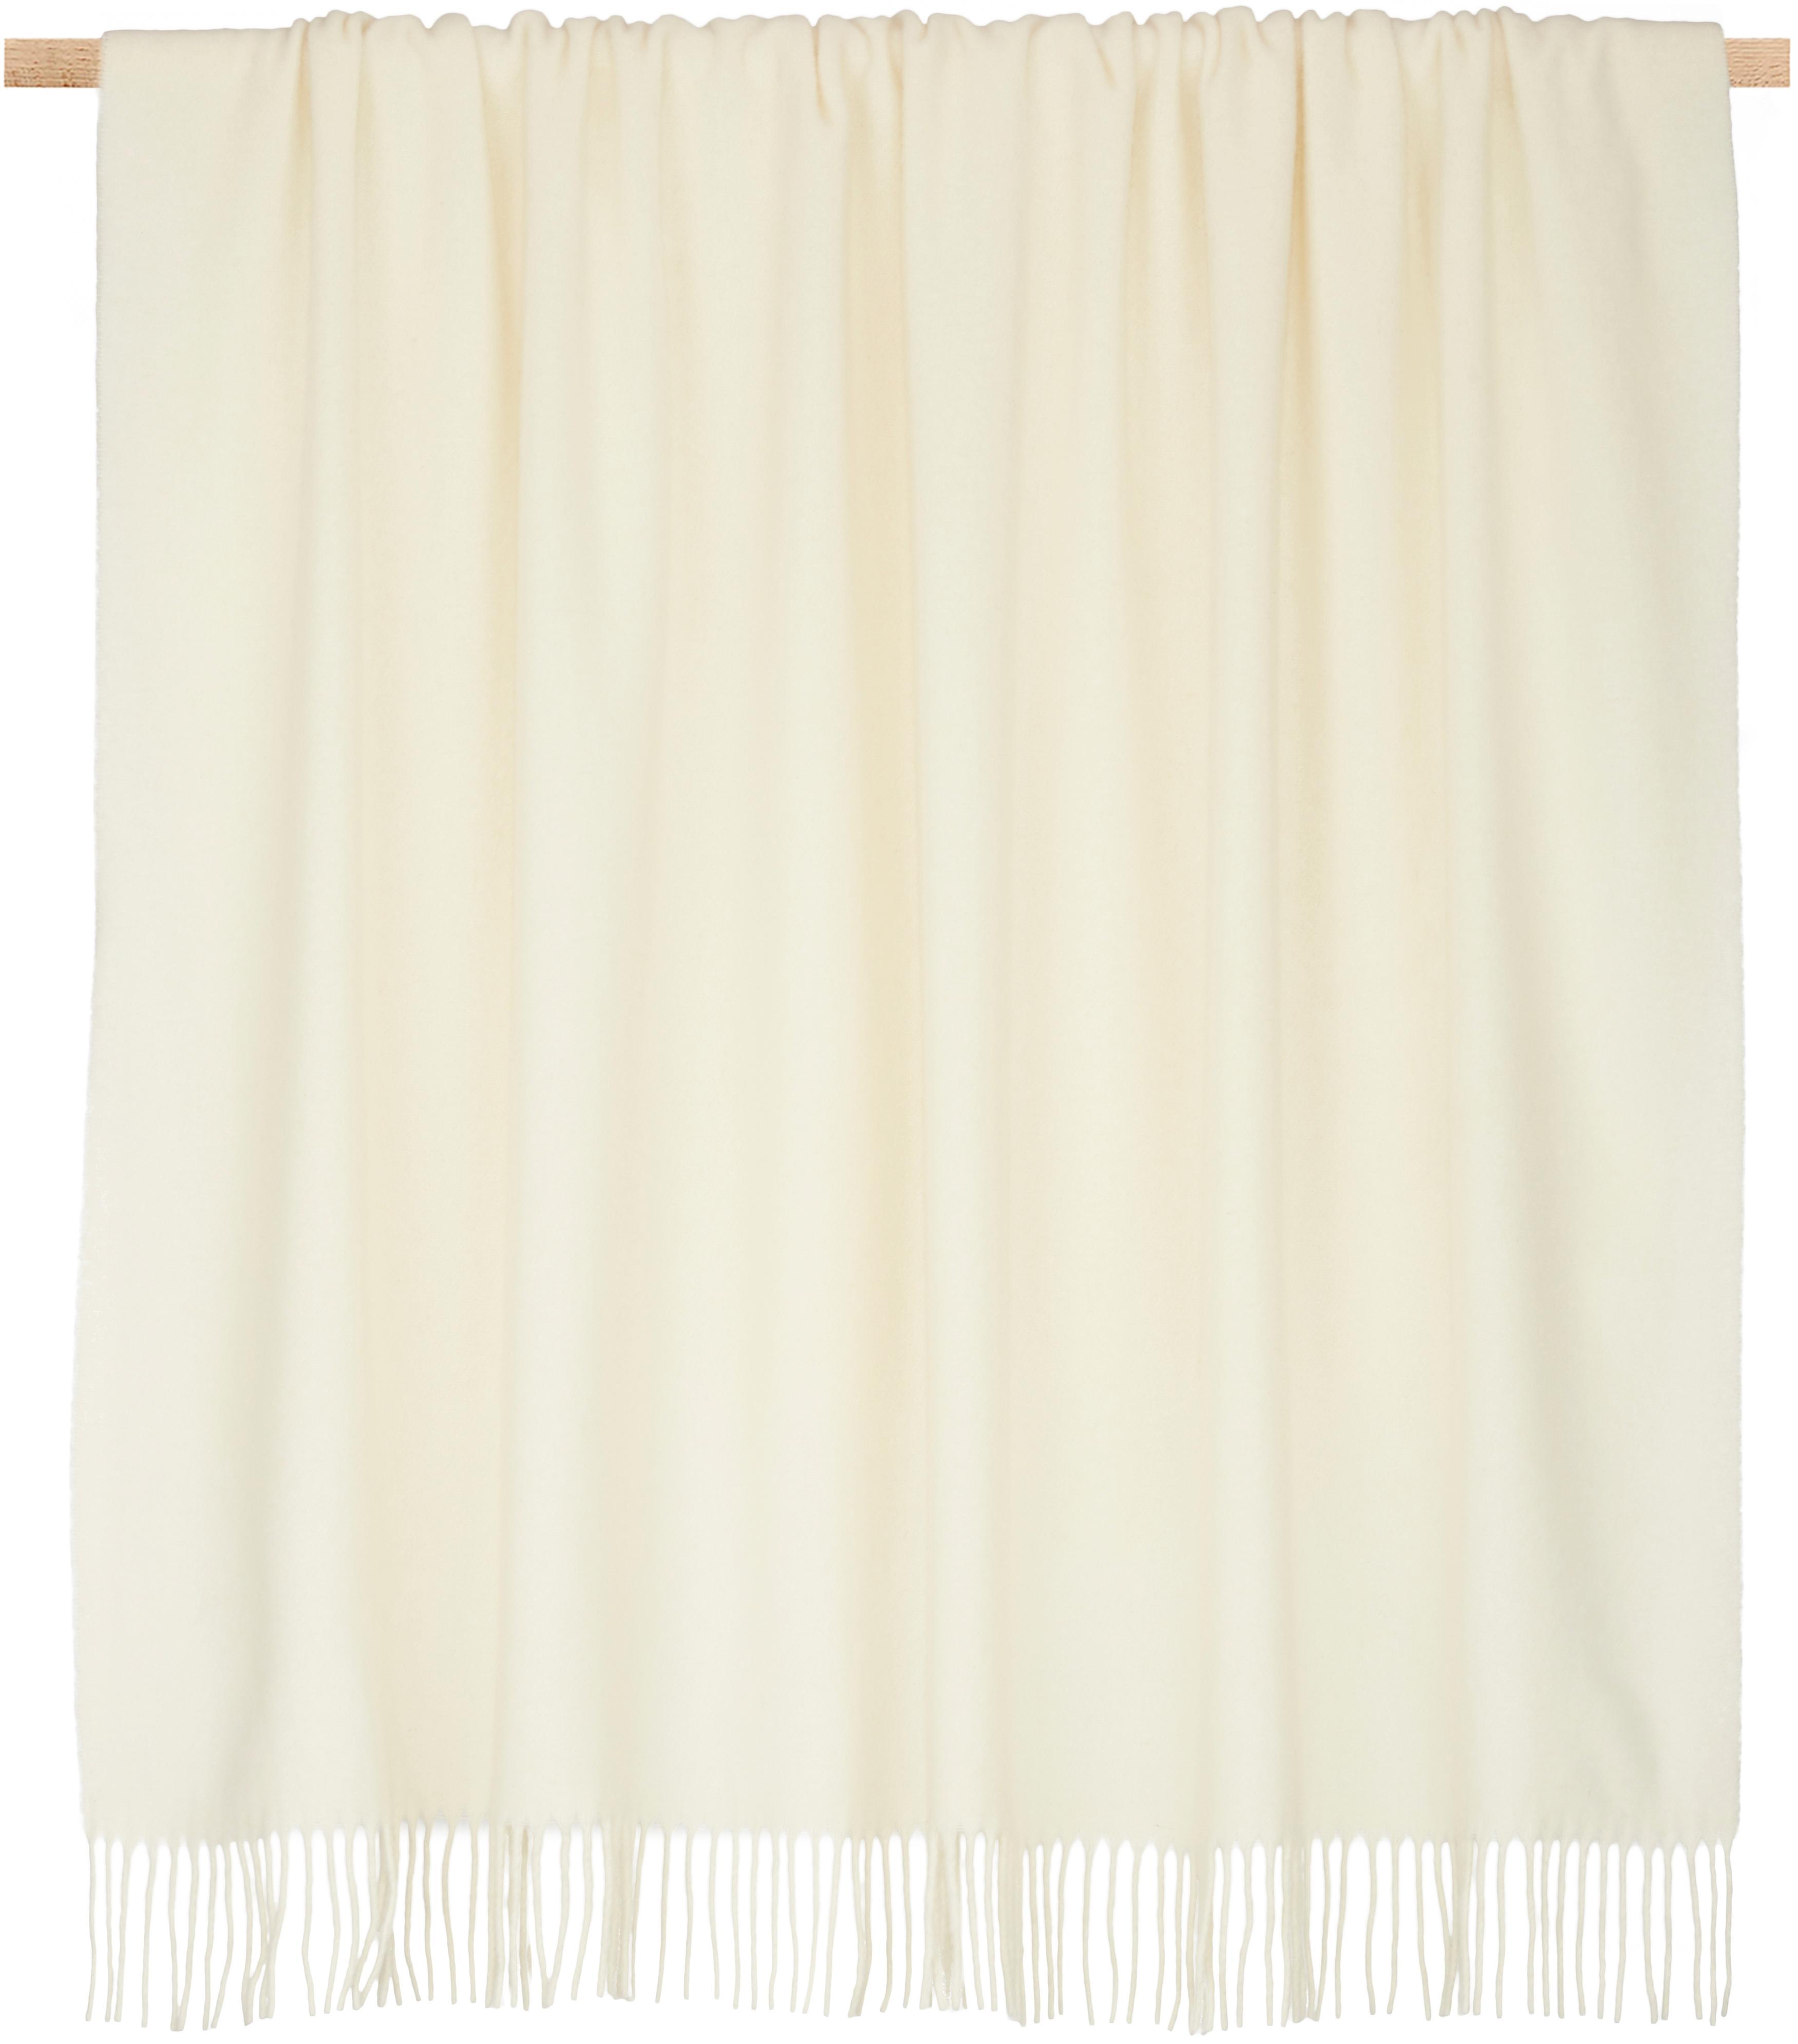 Plaid in lana leggero con finitura a frange Patriciu, 100% lana, Ecru, Larg. 130 x Lung. 170 cm